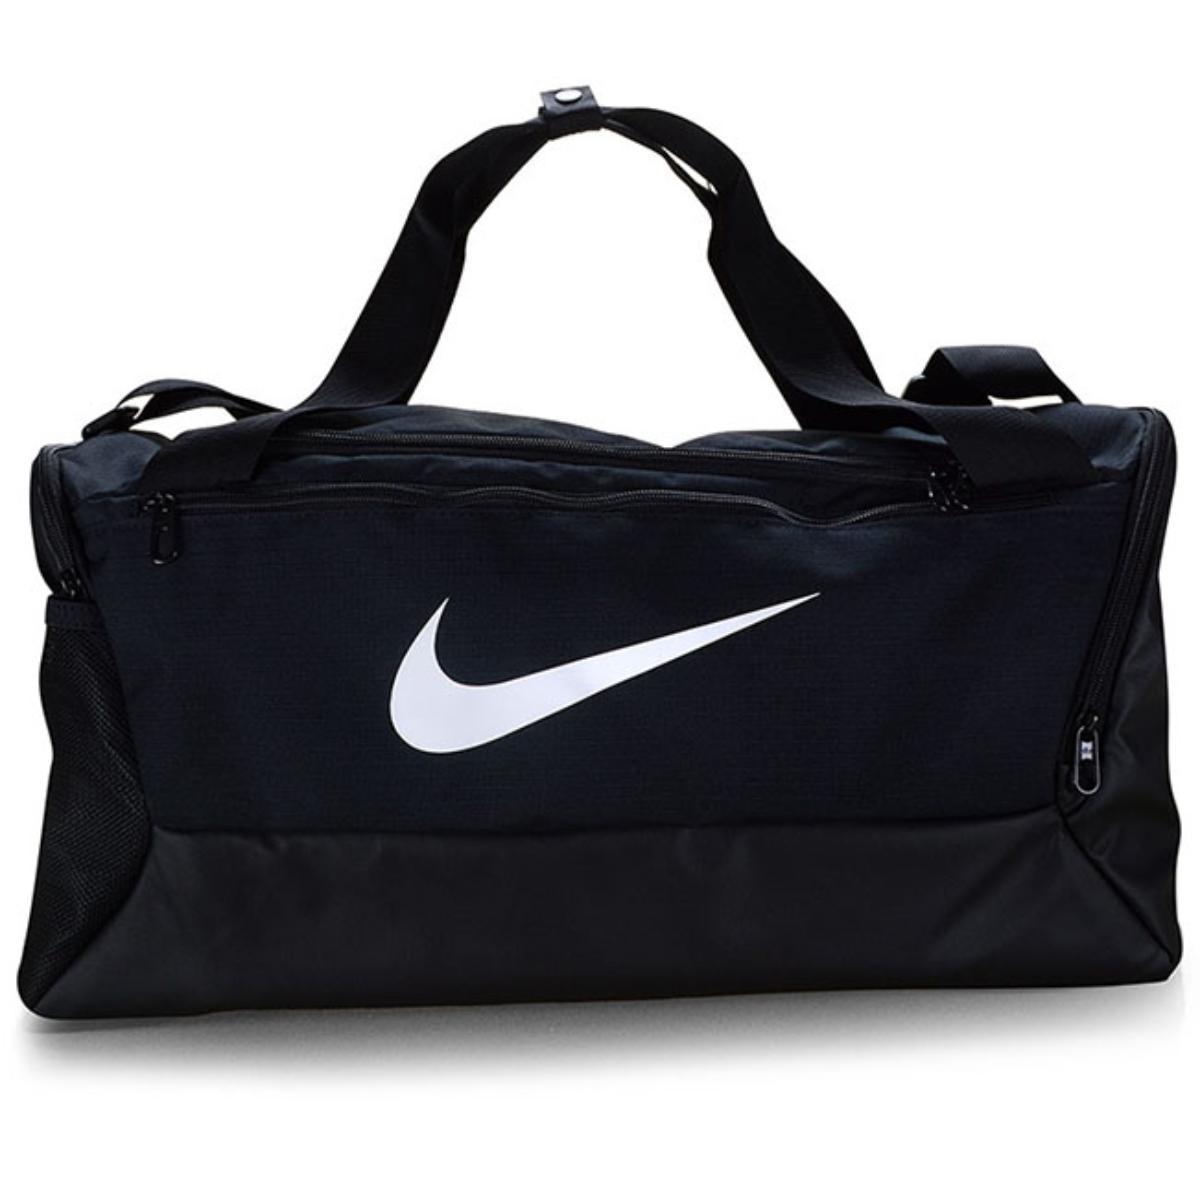 Bolsa Unisex Nike Ba5957-010  Brsla Duff Preto/branco